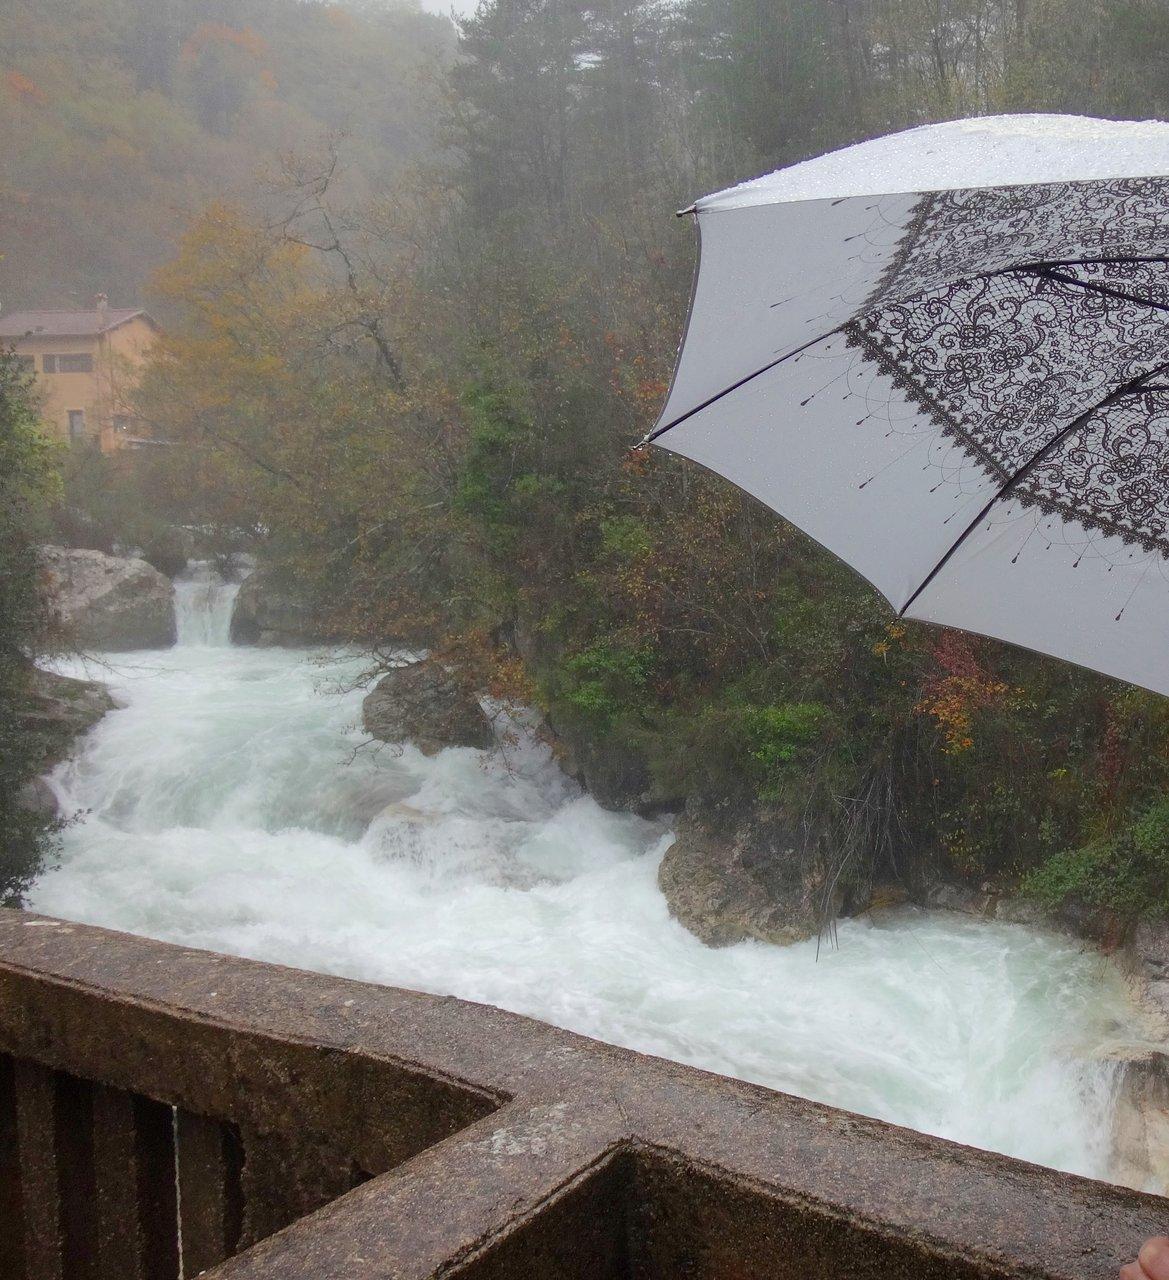 Cascades Du Saut Du Loup Alpes Maritimes 2020 All You